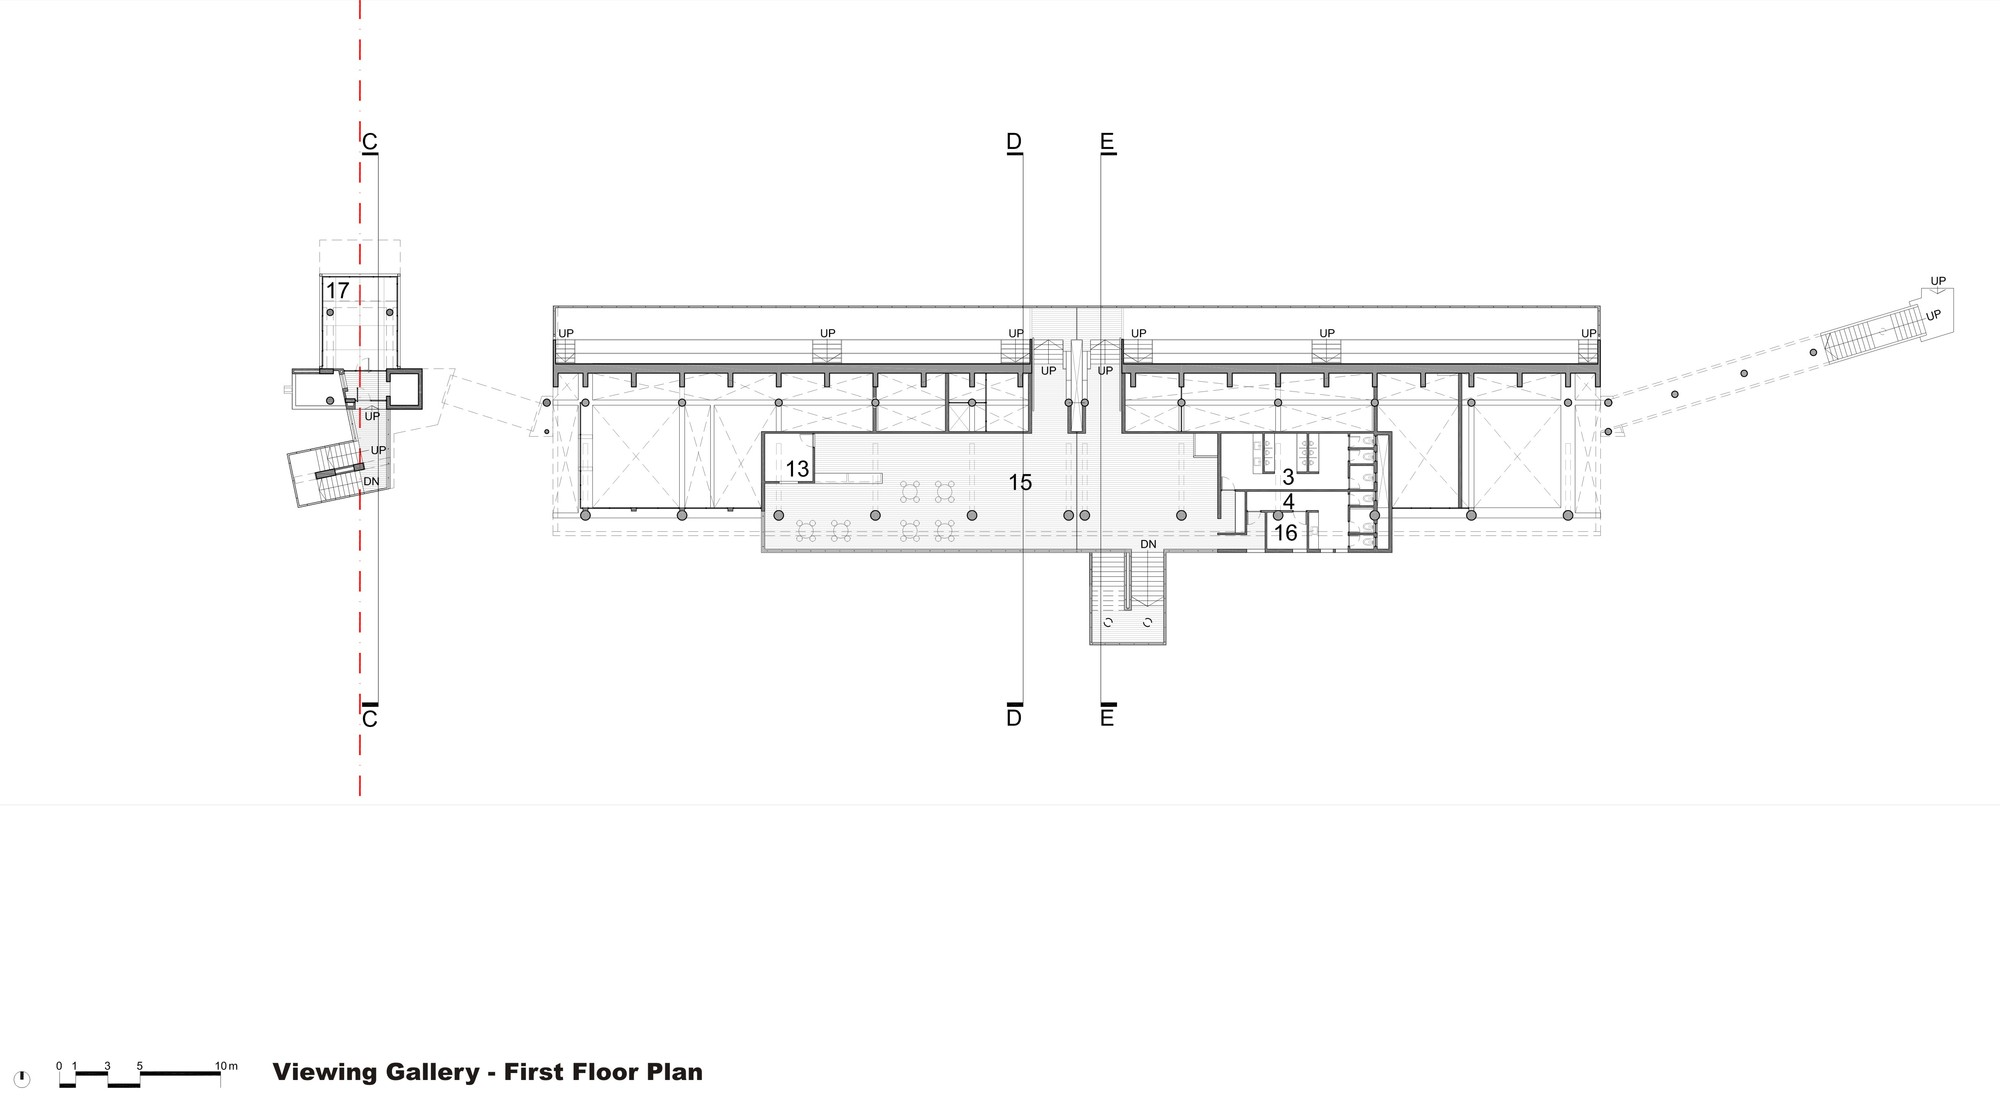 medium resolution of army rowing node floor plan